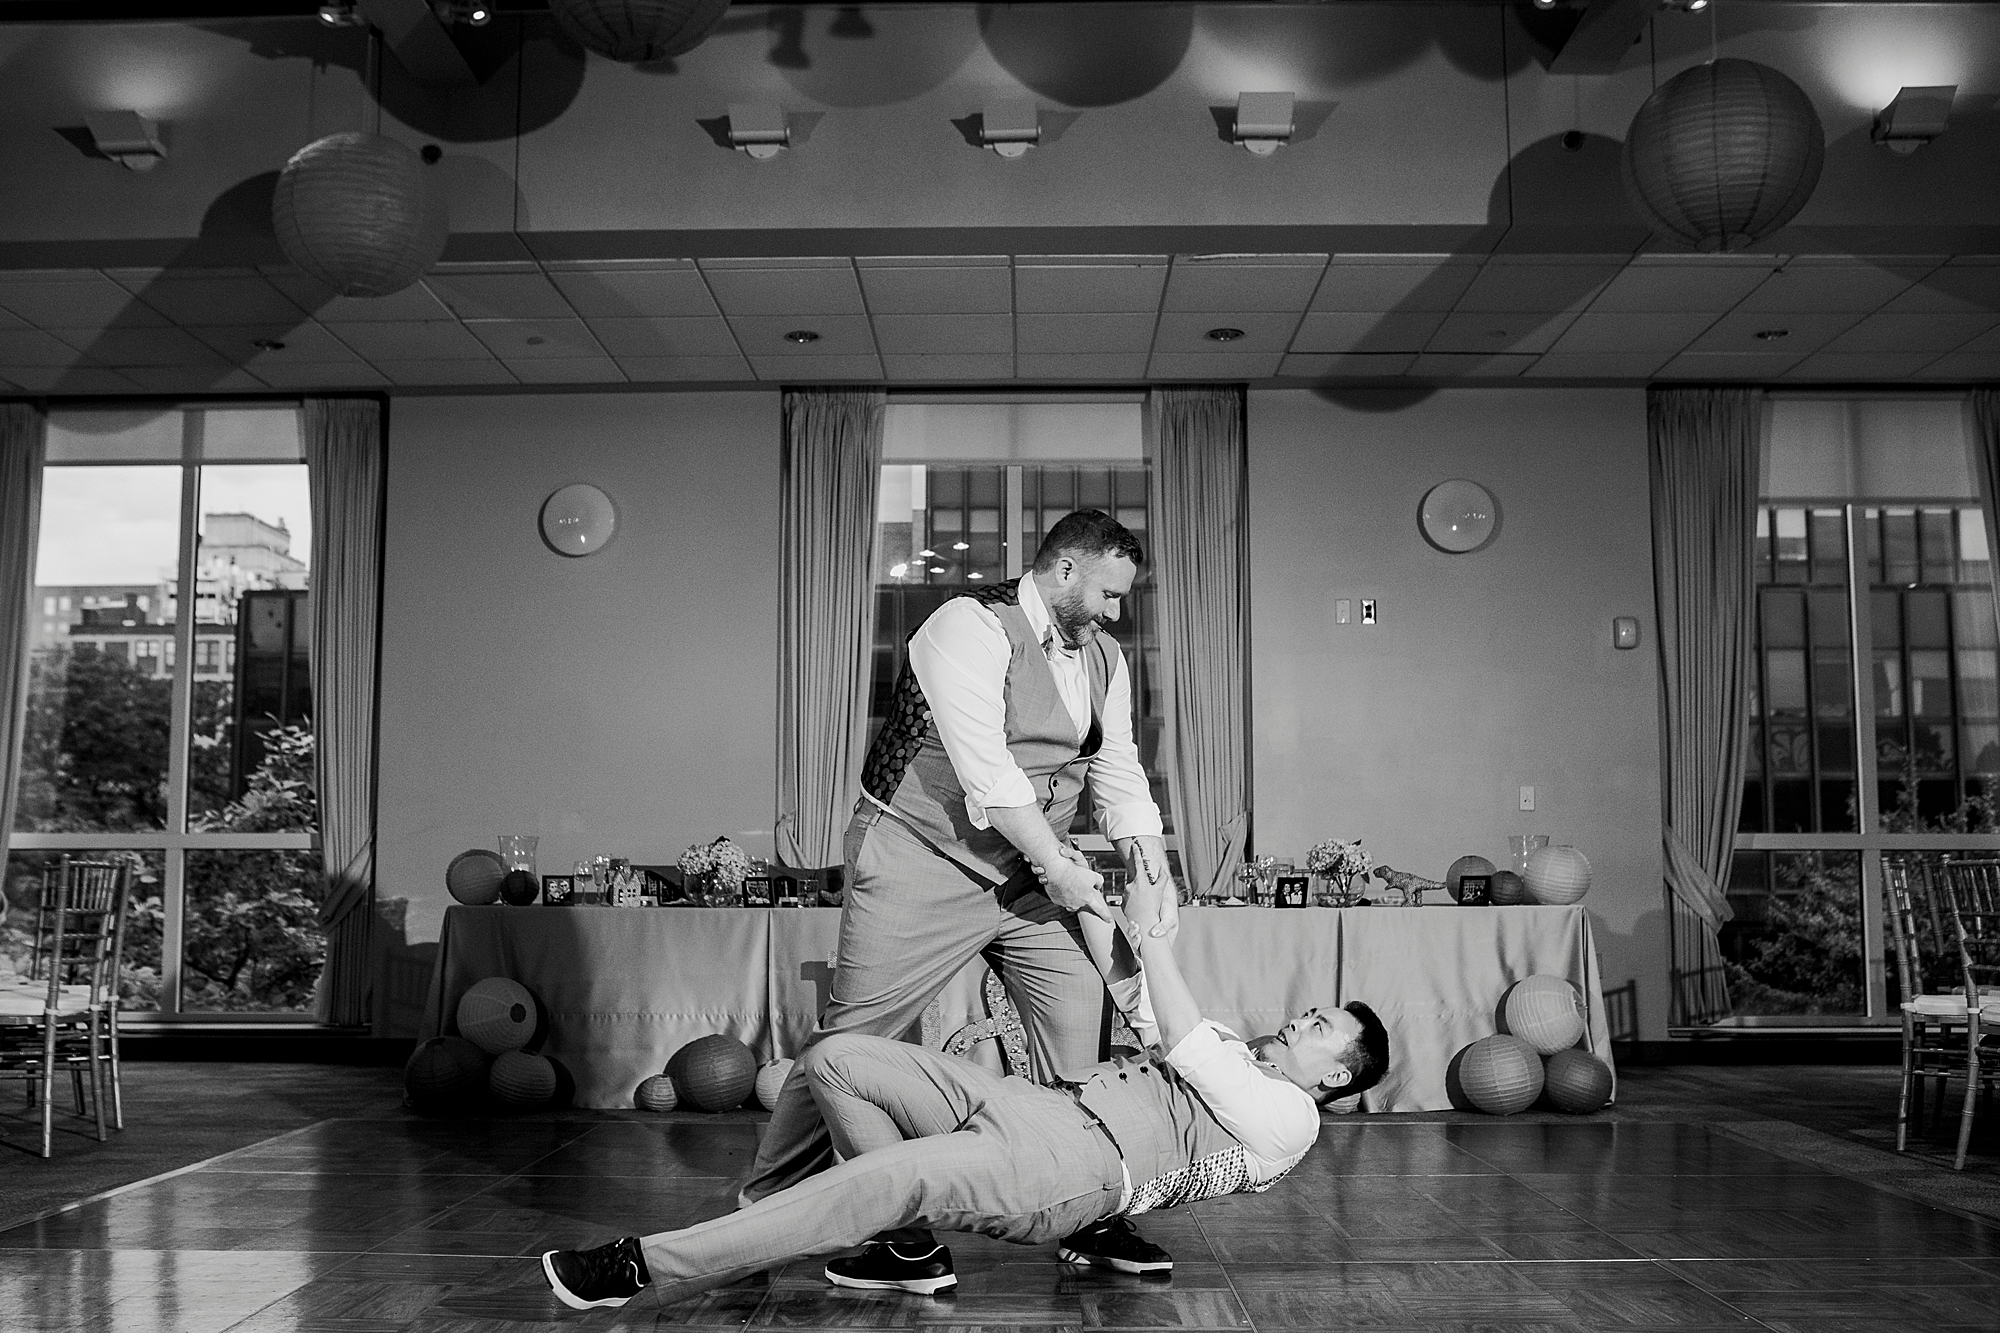 Dan_and_Byron_Love_by_Joe_Mac_Philadelphia_Wedding_LGBTQ_Photography_Gay_Independence_visitor_Center_130.JPG